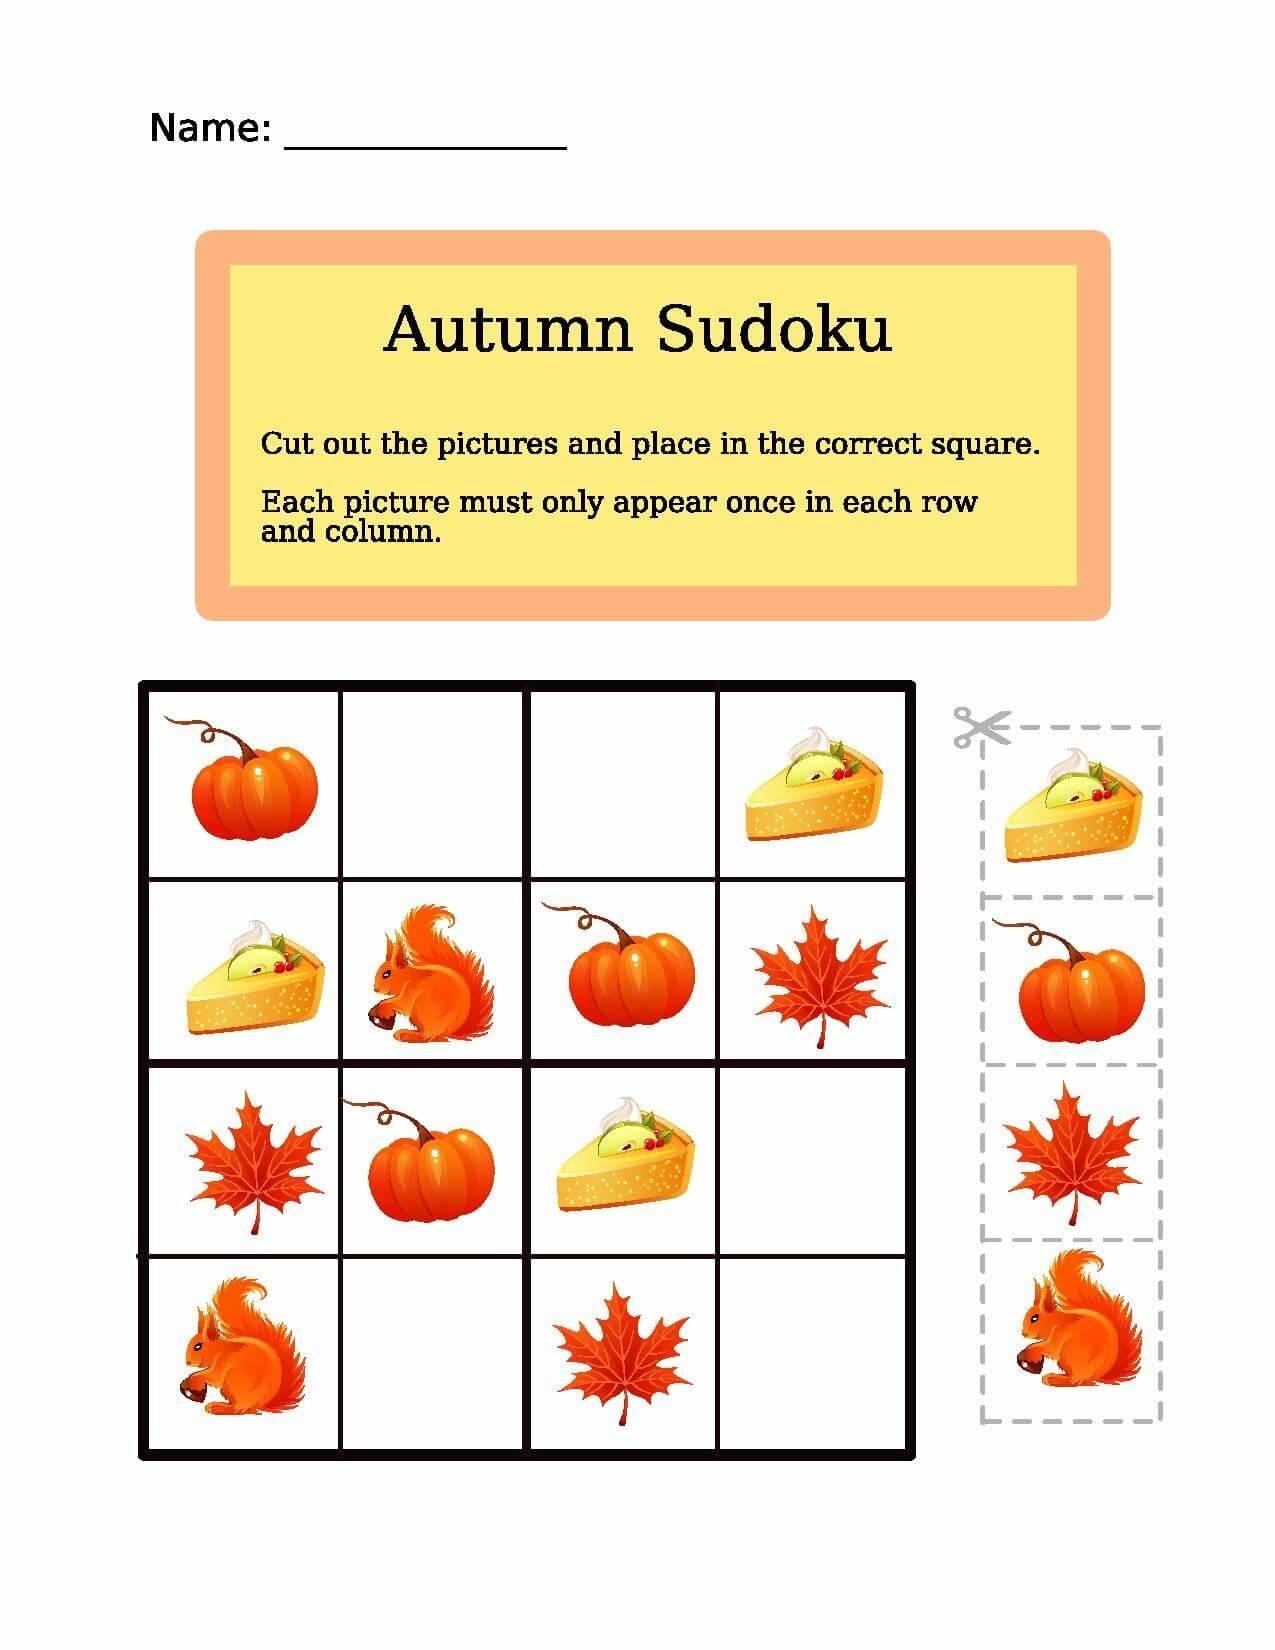 Autumn Sudoku Puzzle | Free Printable Puzzle Games